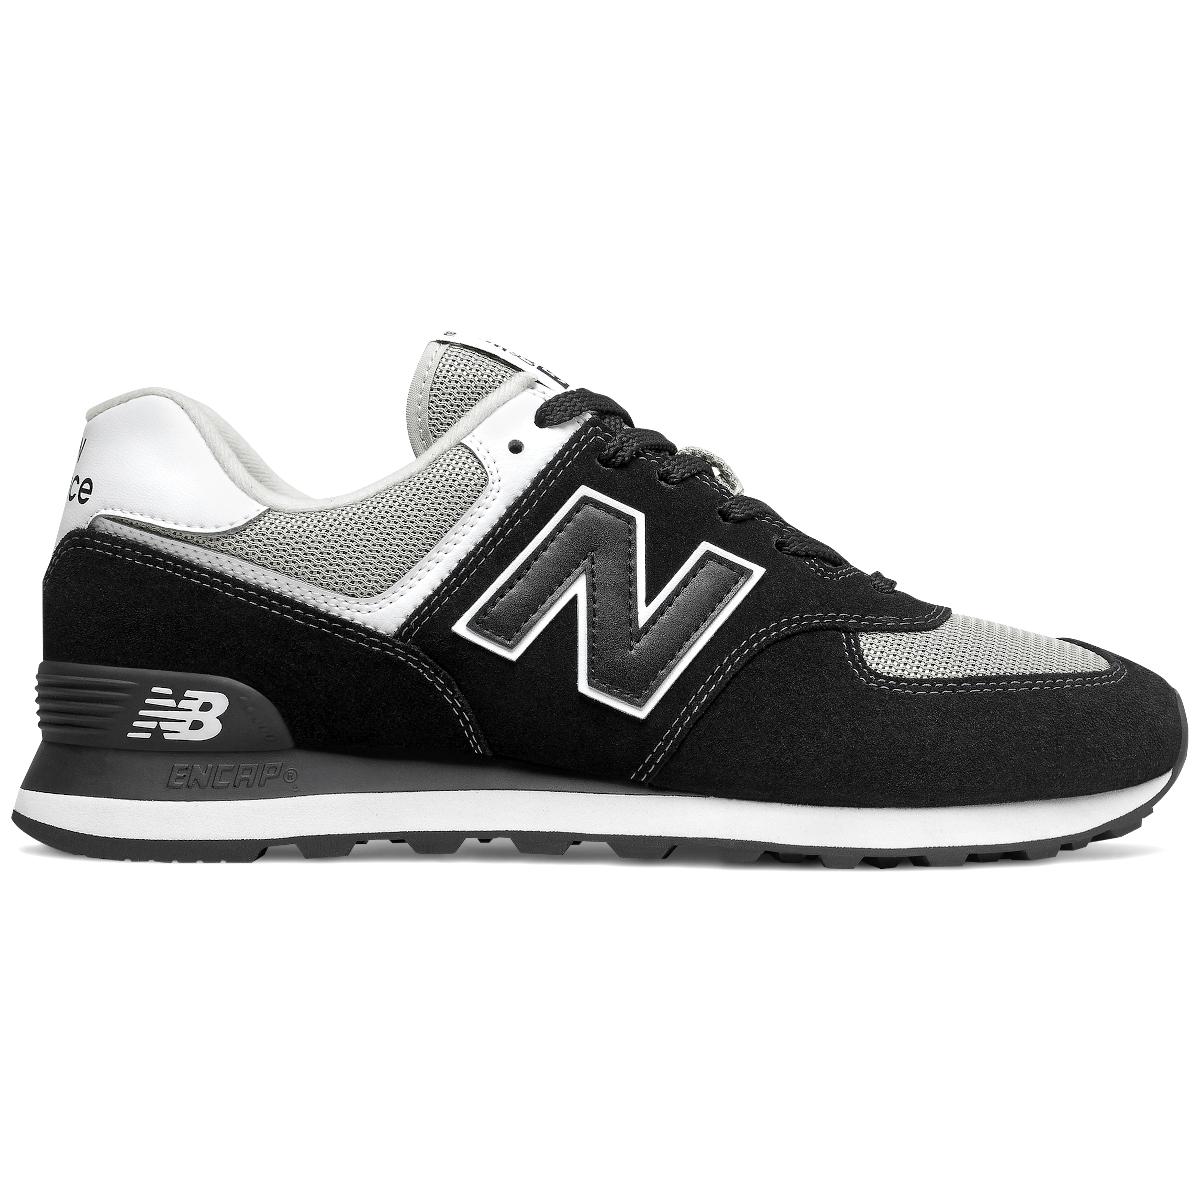 New Balance ML574SSN Sneaker schwarz weiß grau